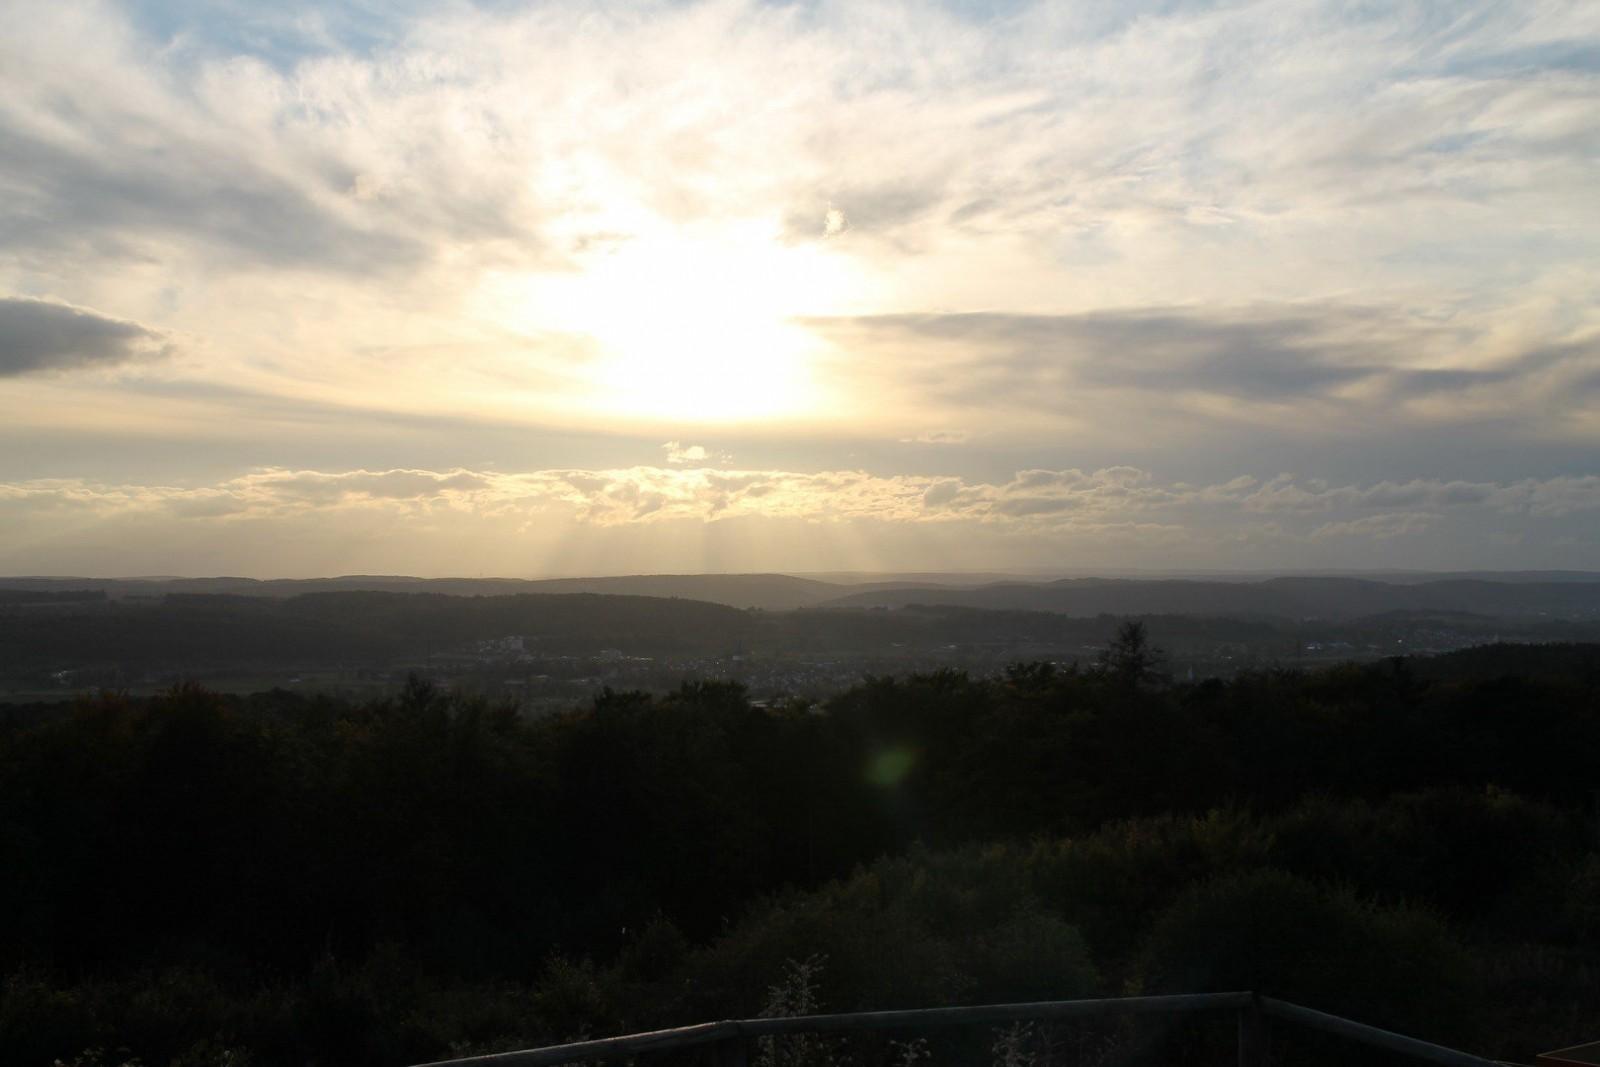 Sunset in Leonberg